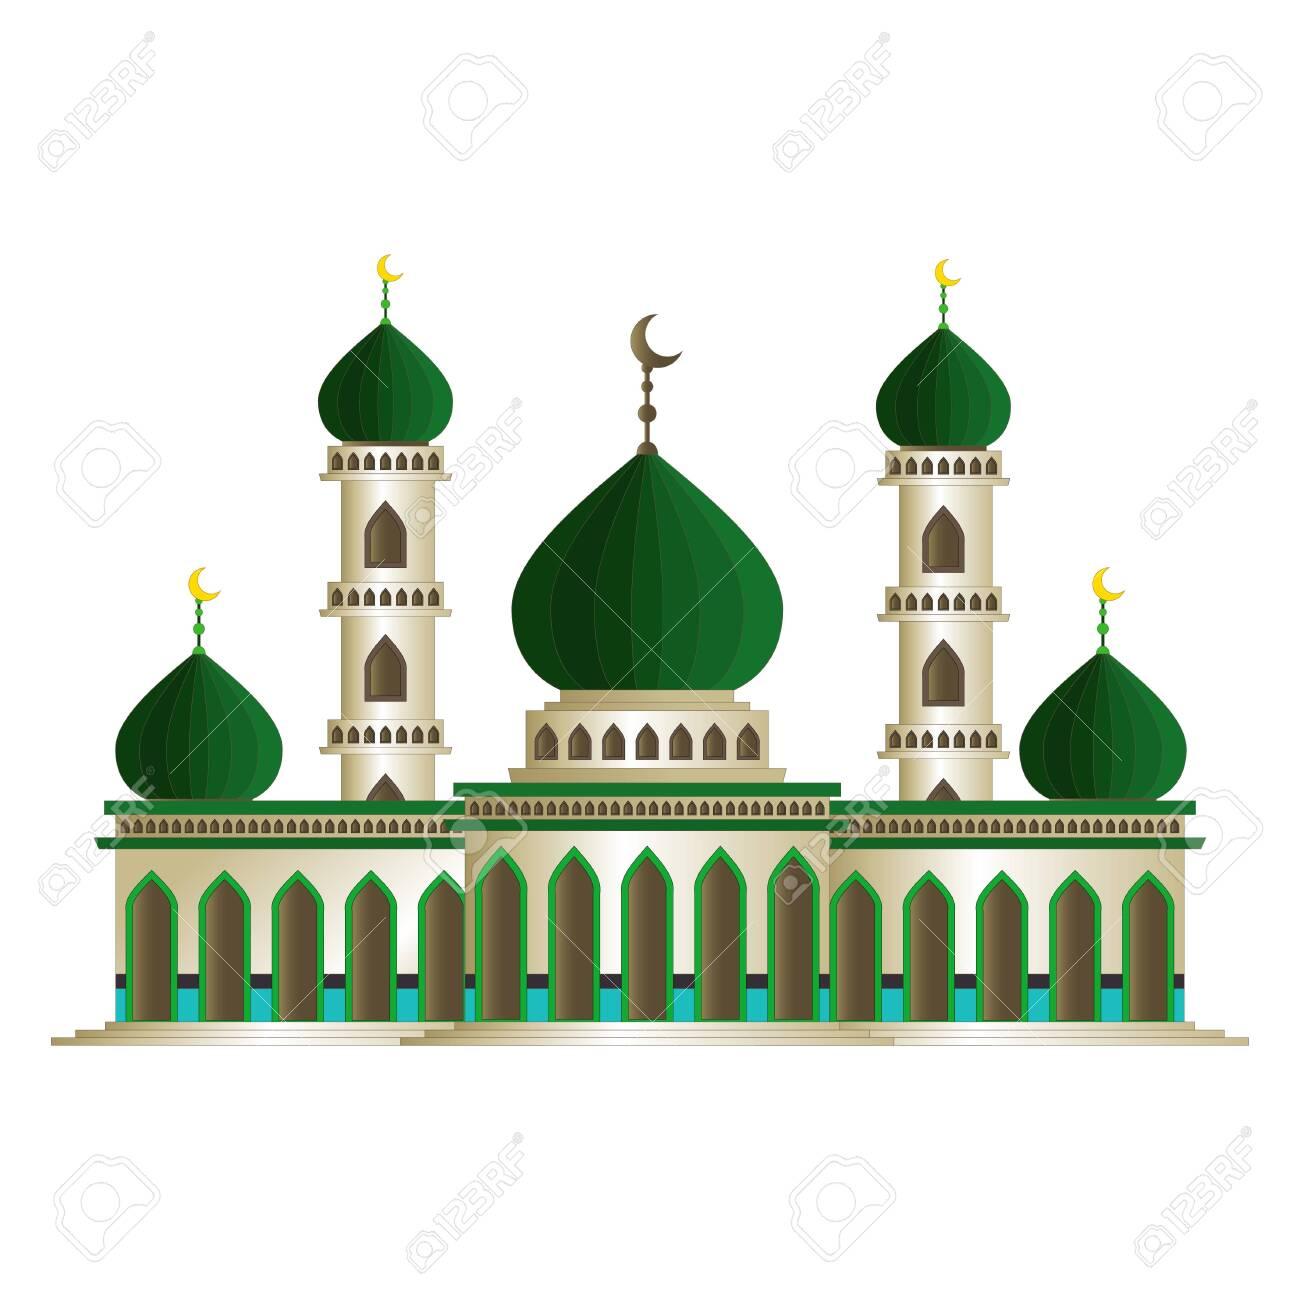 Beautiful Islamic Mosque Cartoon - 145998218